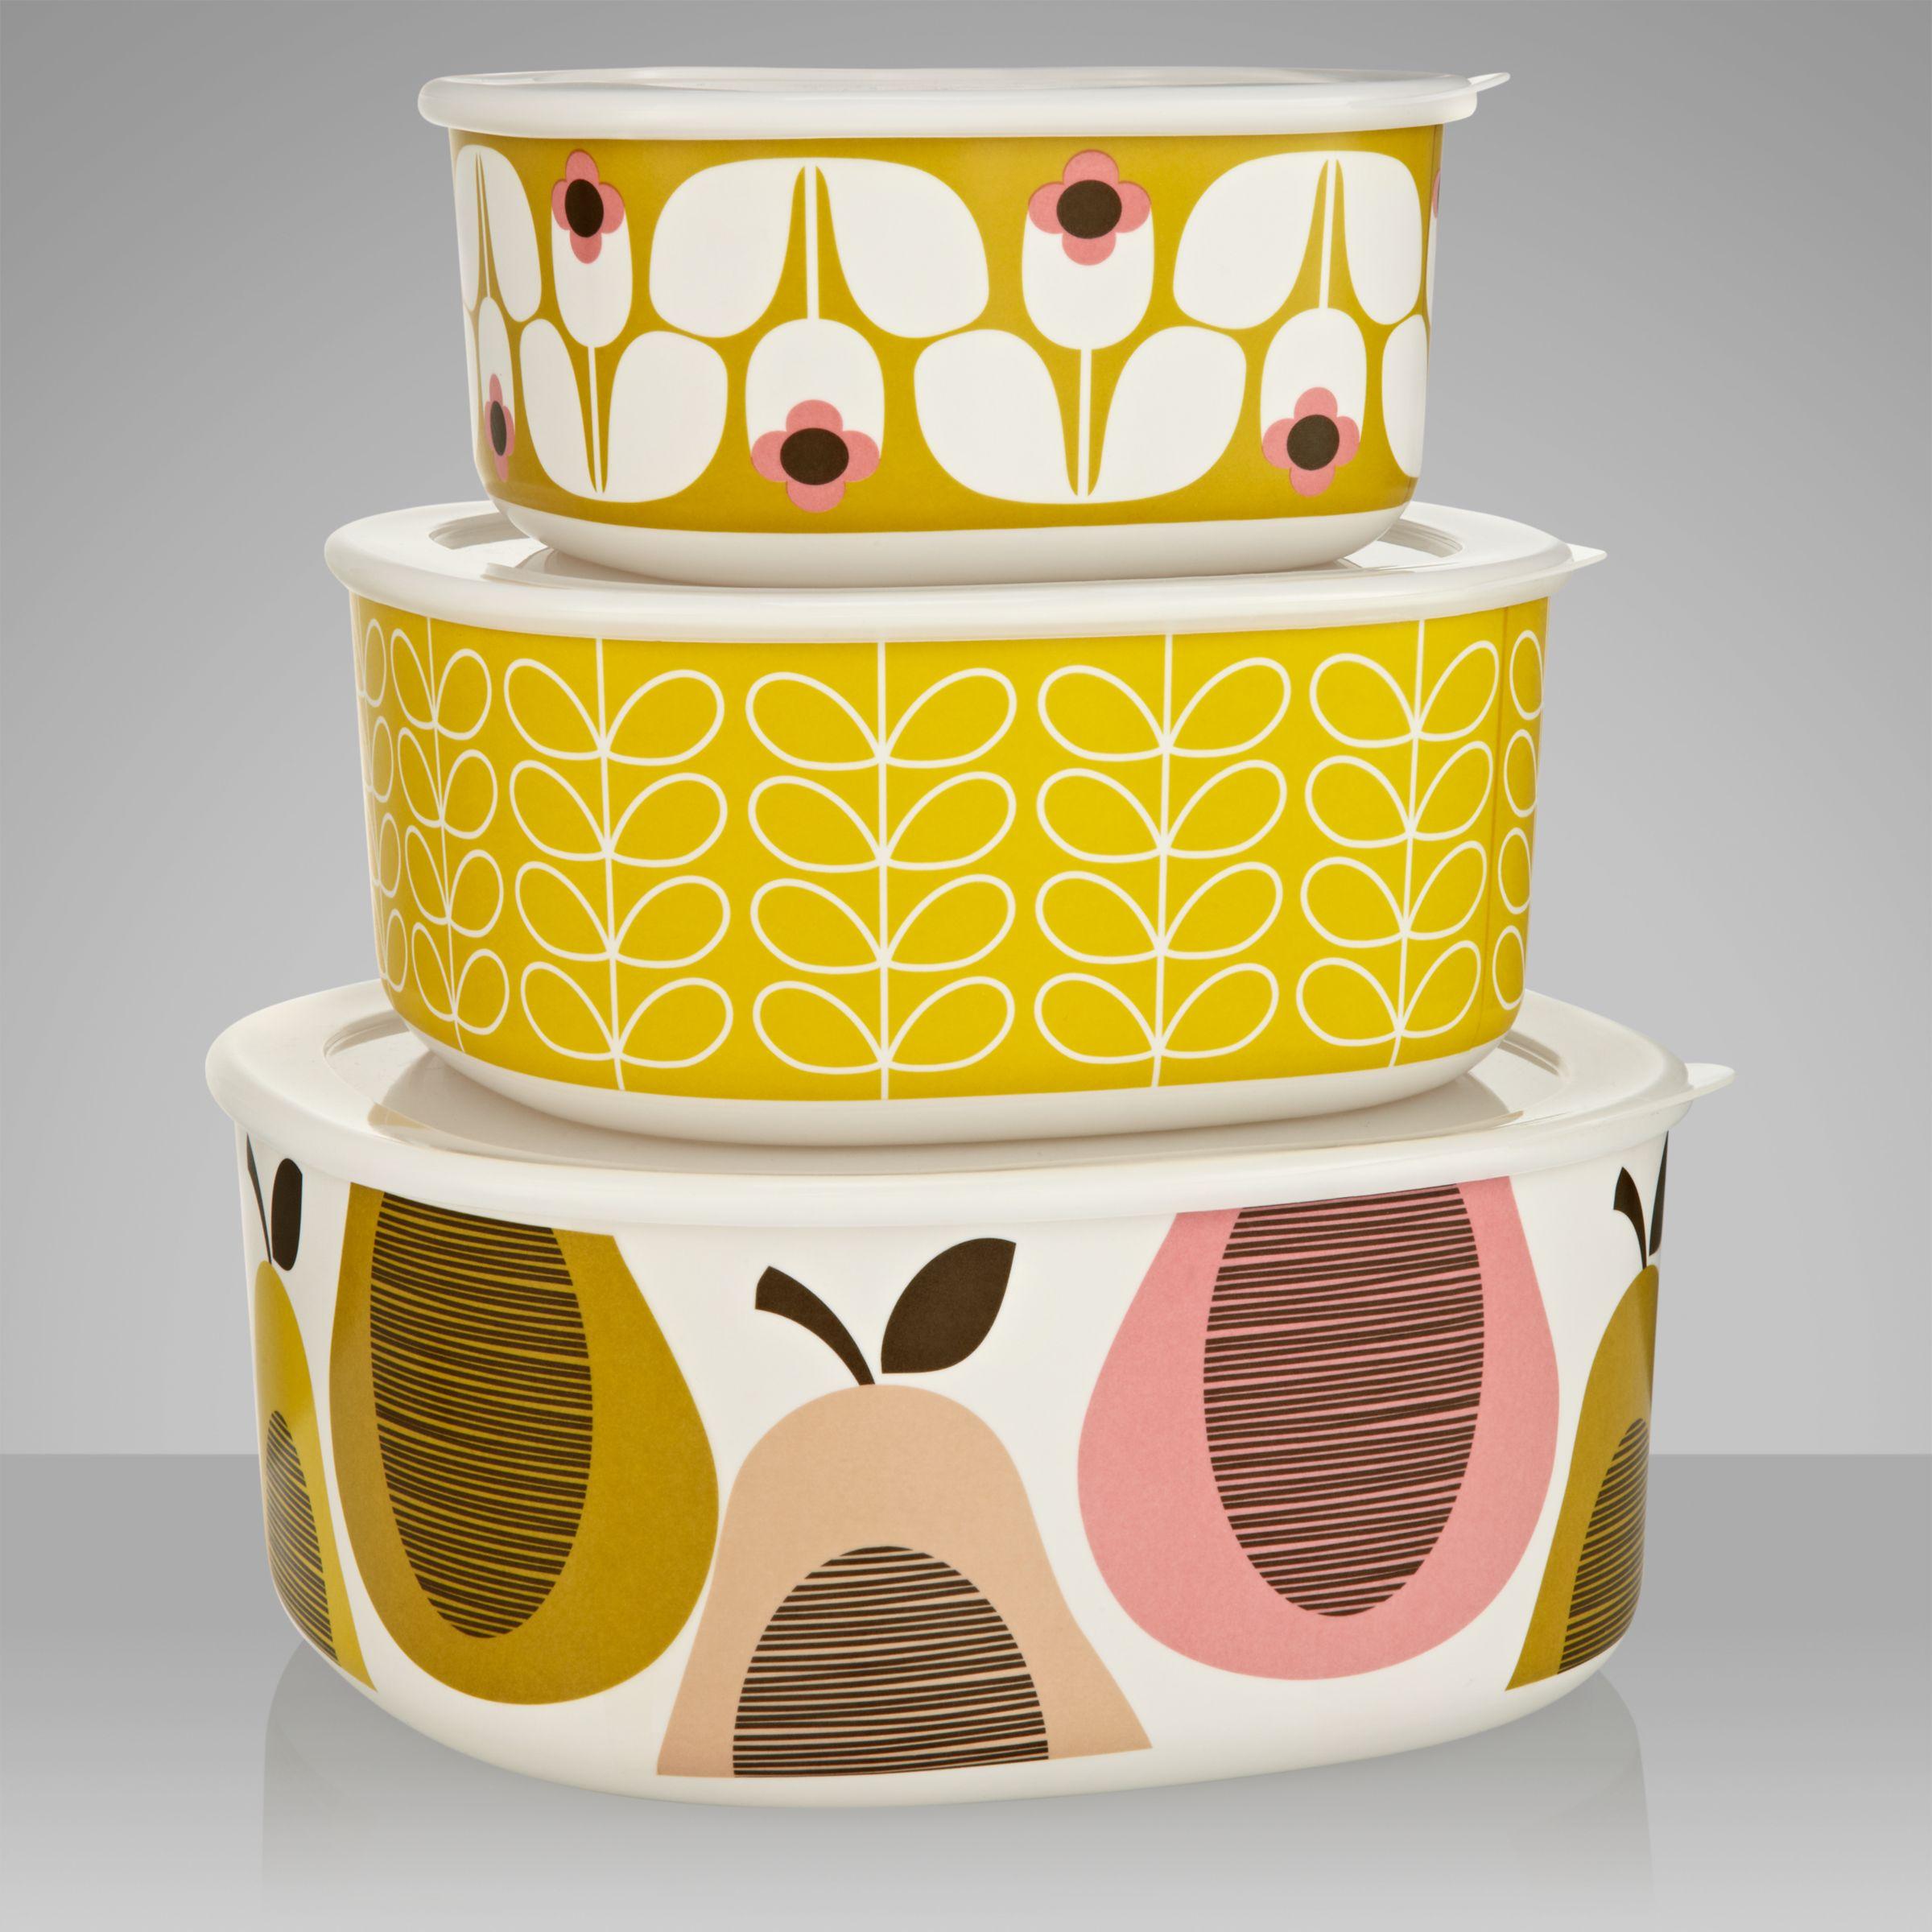 Orla Kiely Pear Melamine Picnic Bowls, Multi, Set of 3